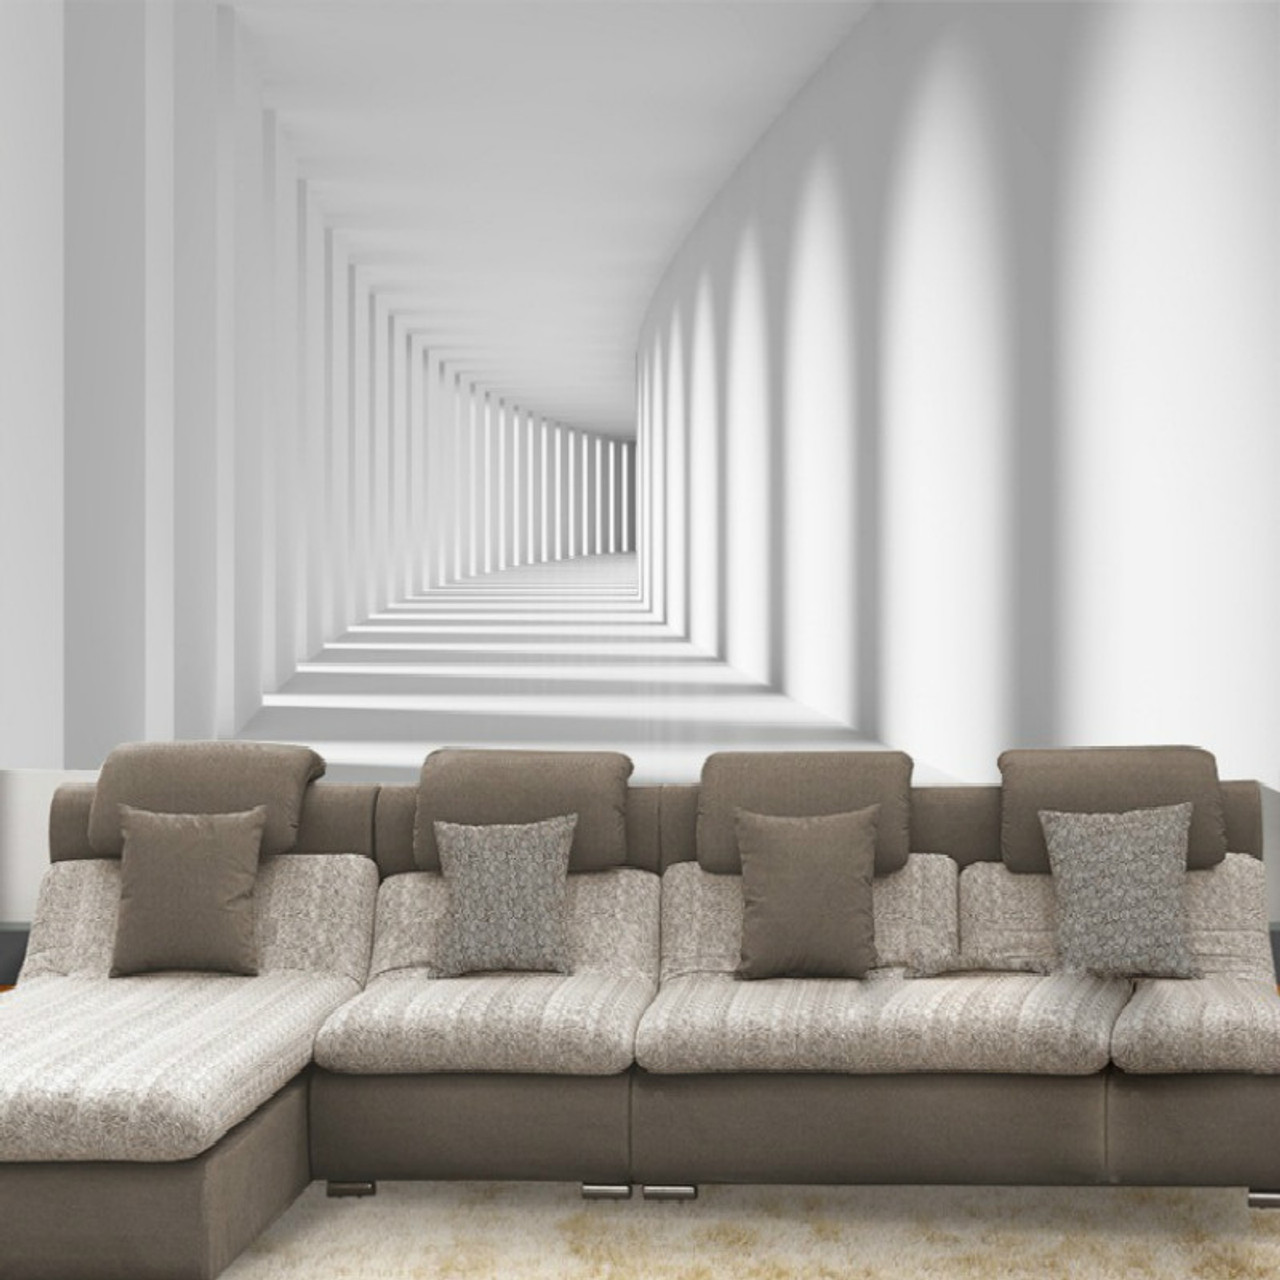 3d Wallpaper For Walls 3d Mural Wallpaper Sofa Tv Background Wall Photo Wallpaper For Living Room Onshopdeals Com